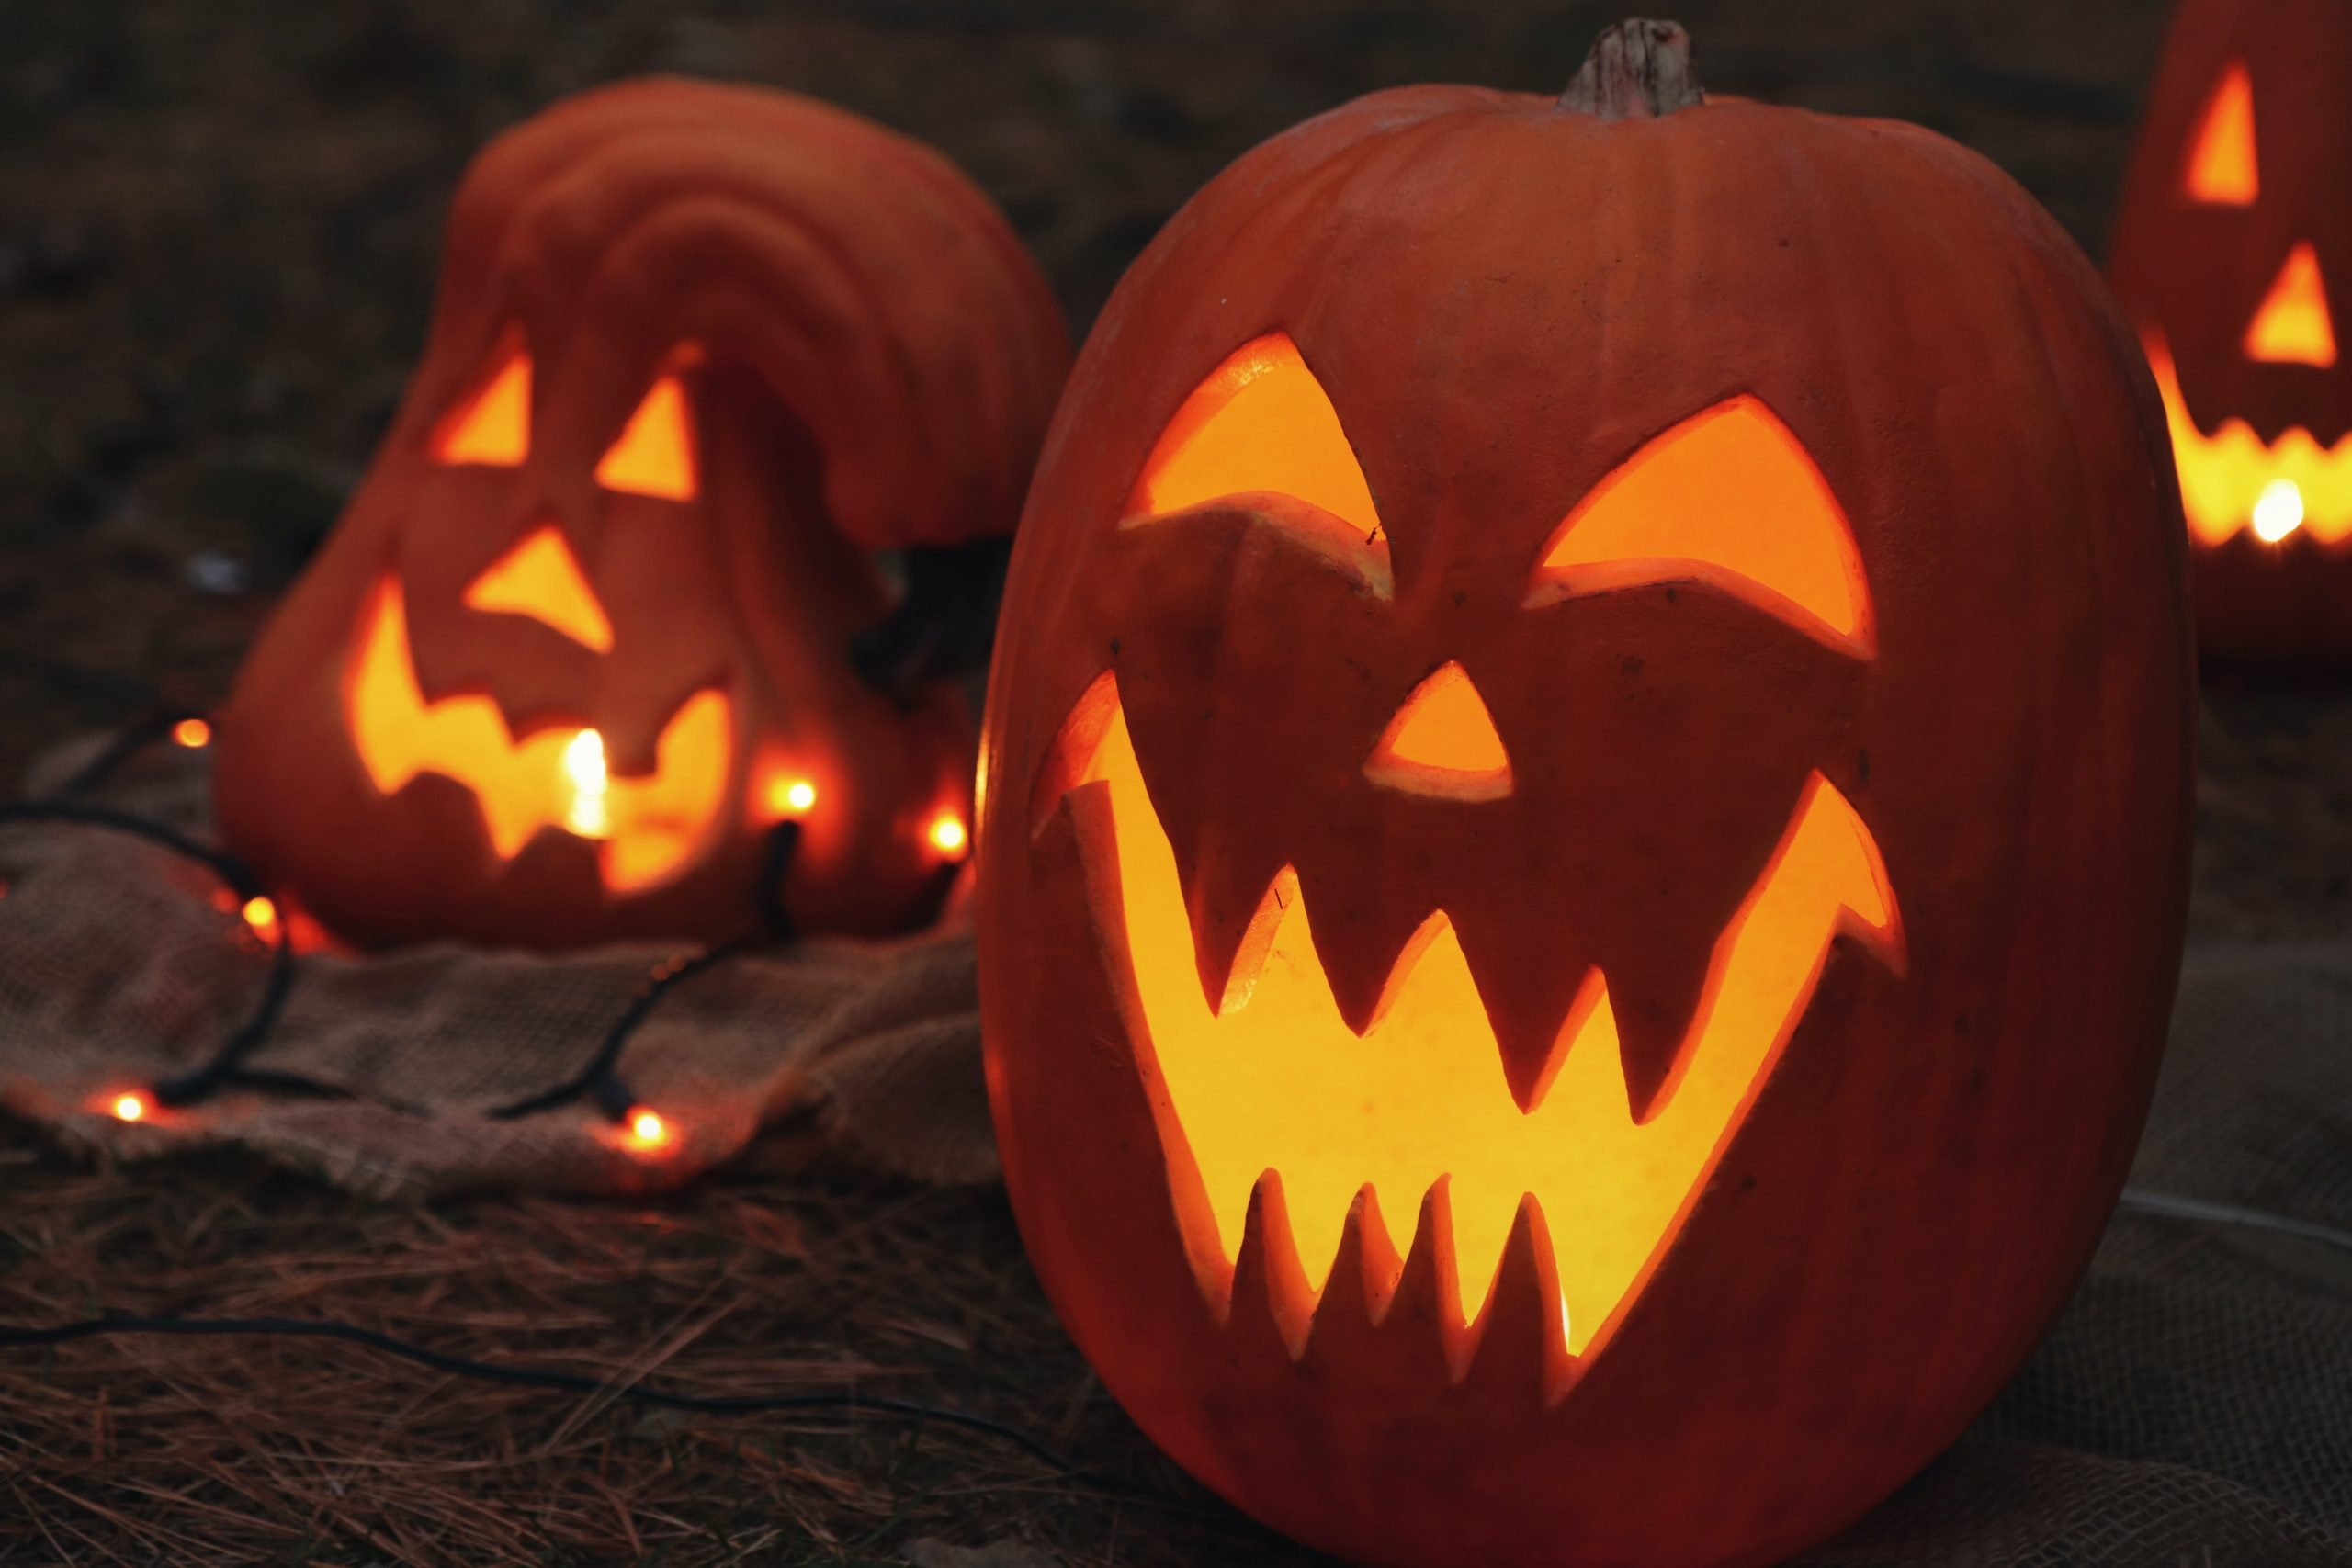 Carved Pumpkins - Photo by Jen Theodore via unsplash